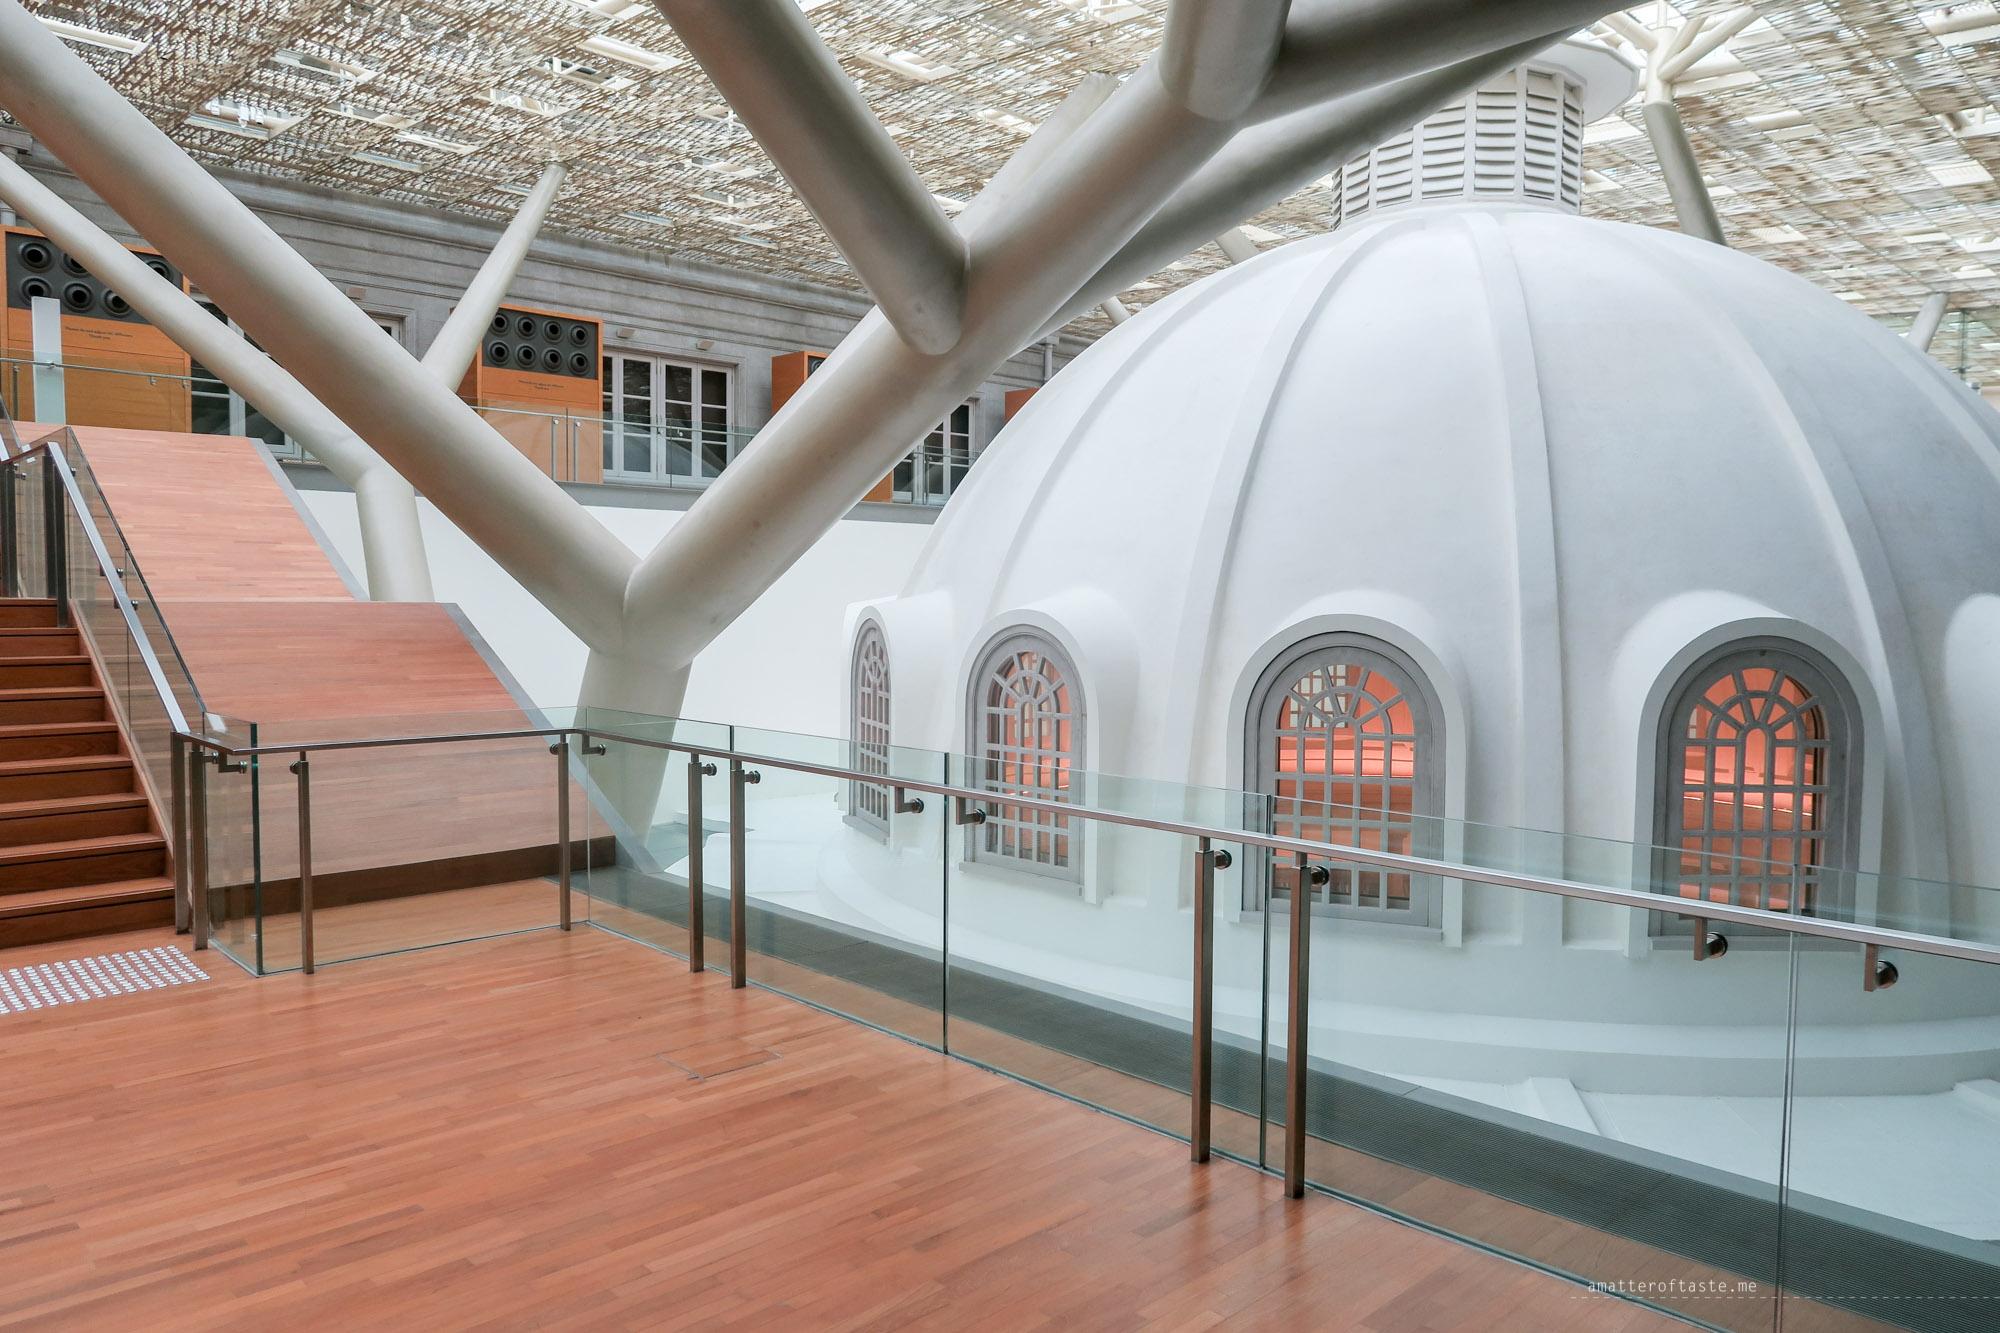 16-National-Gallery-Singapore-building-interior